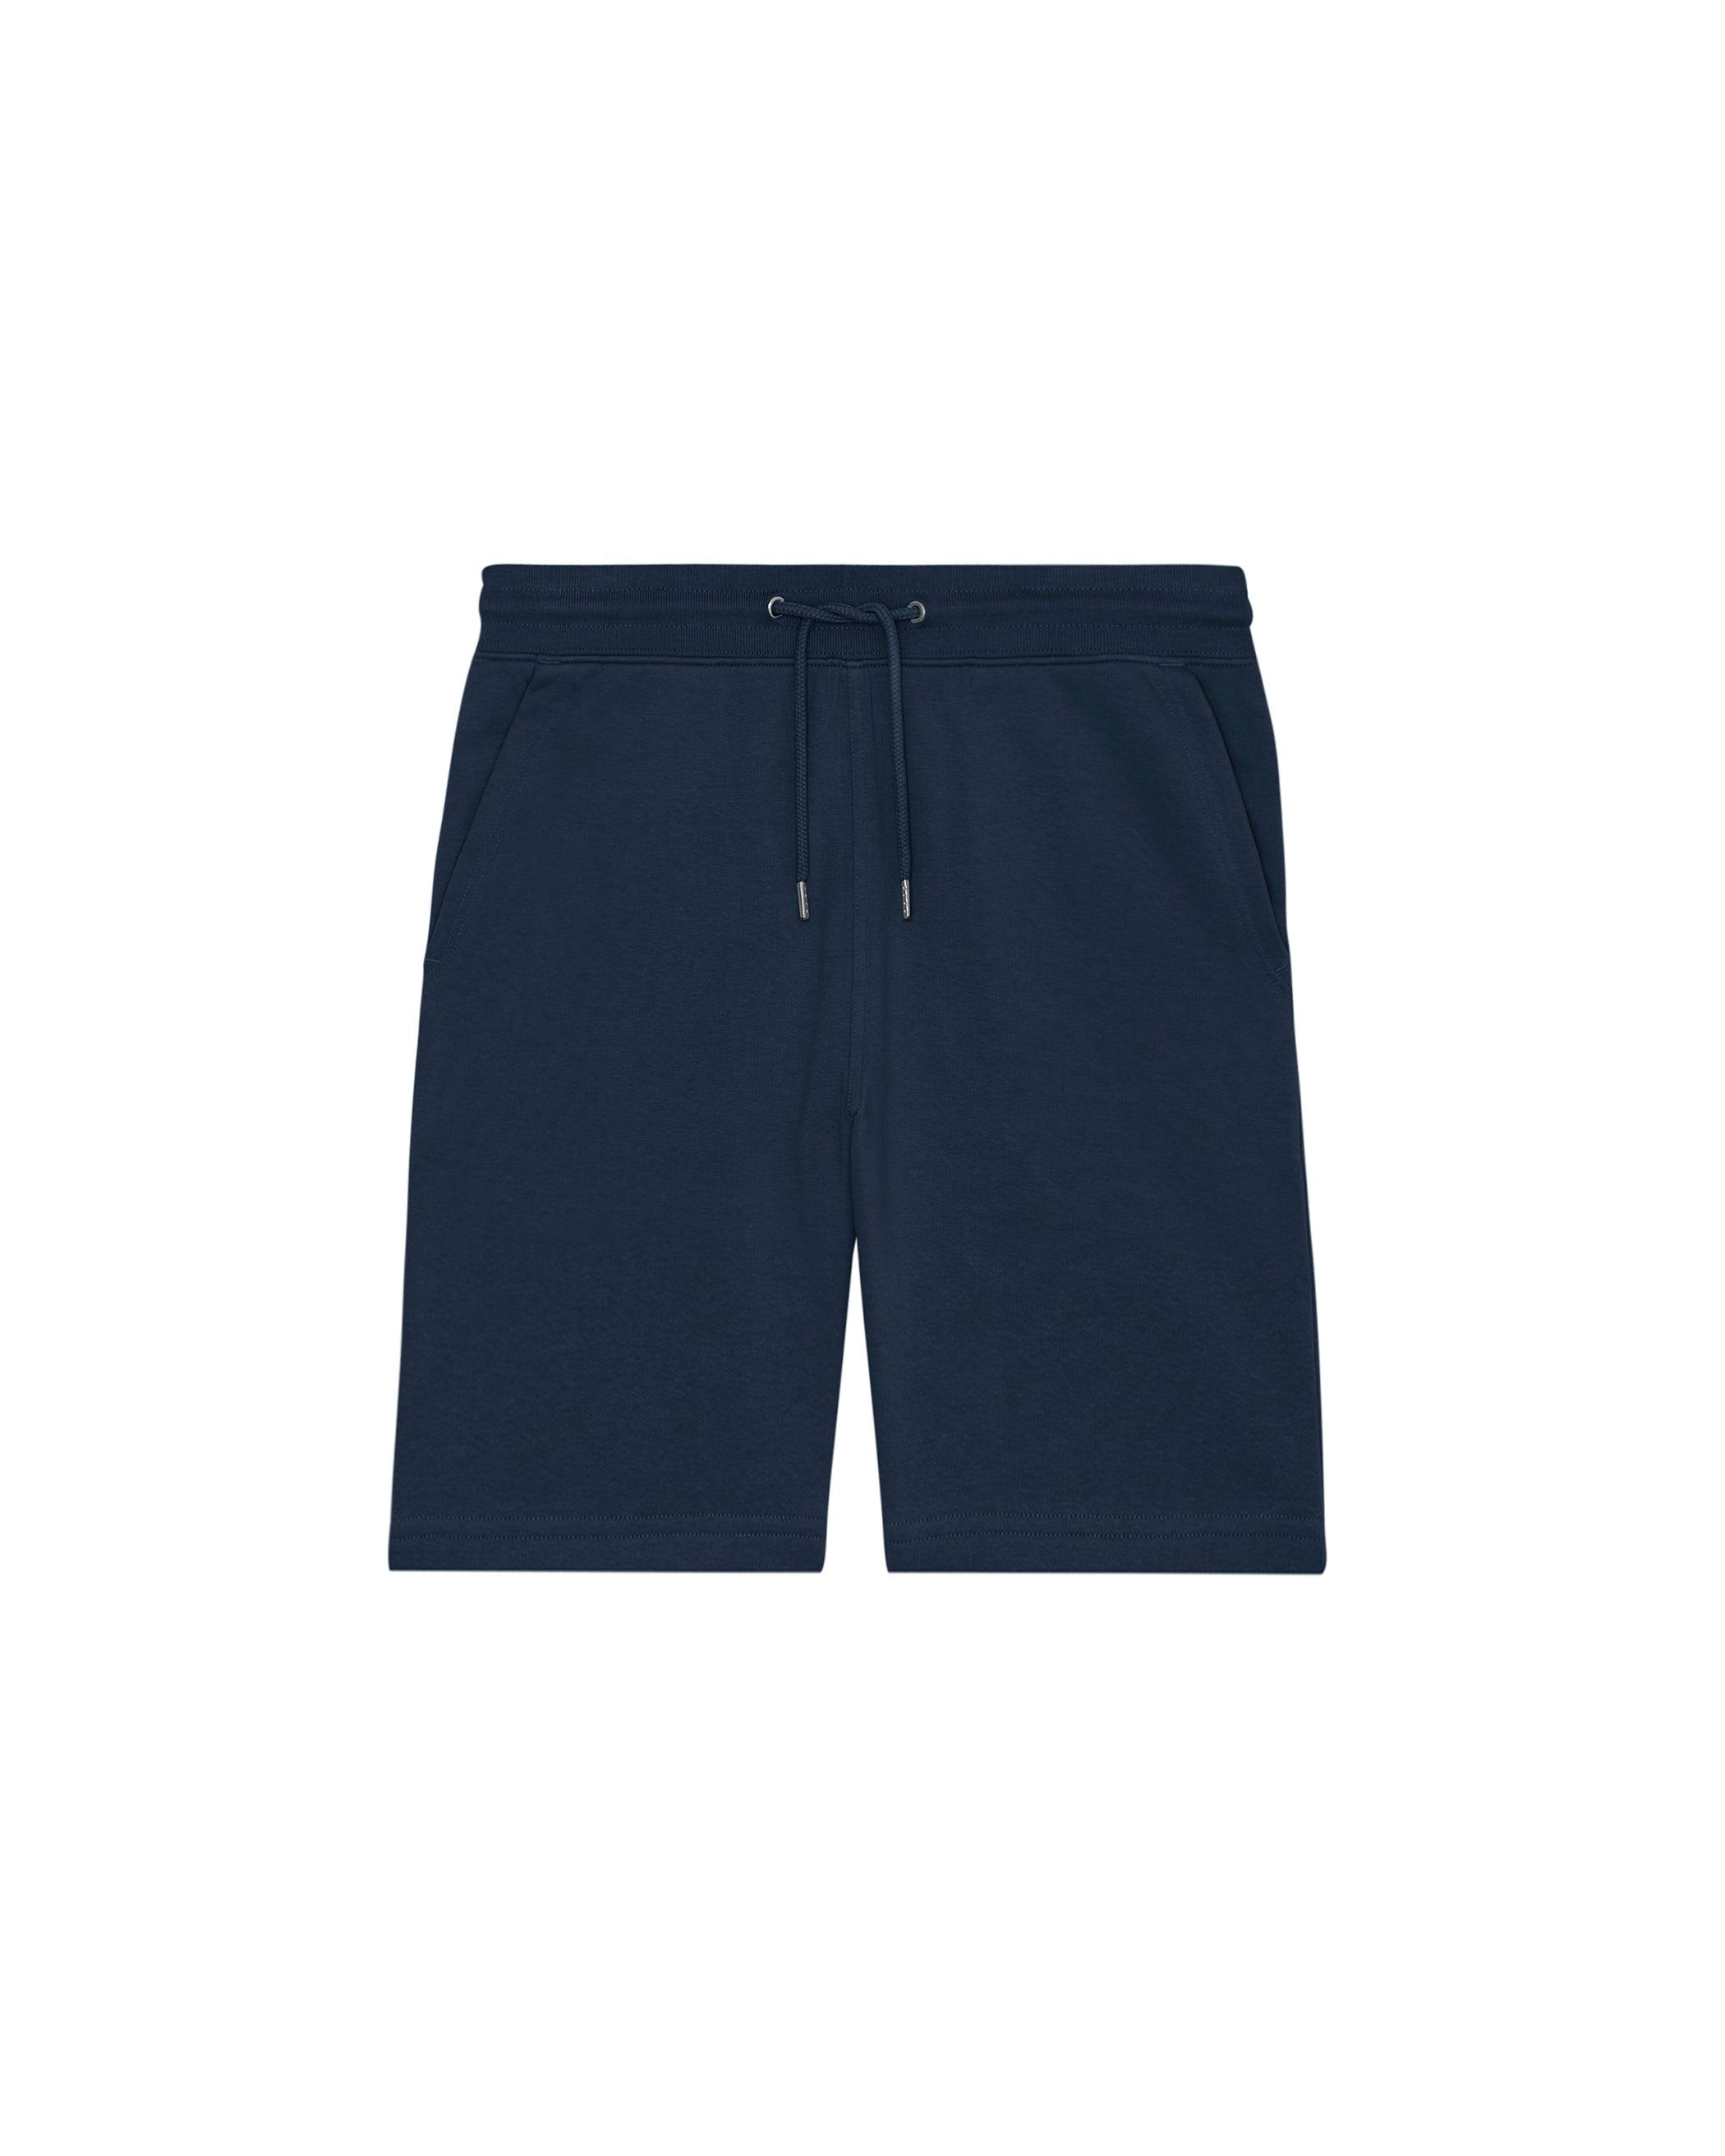 Savi Track Shorts Navy